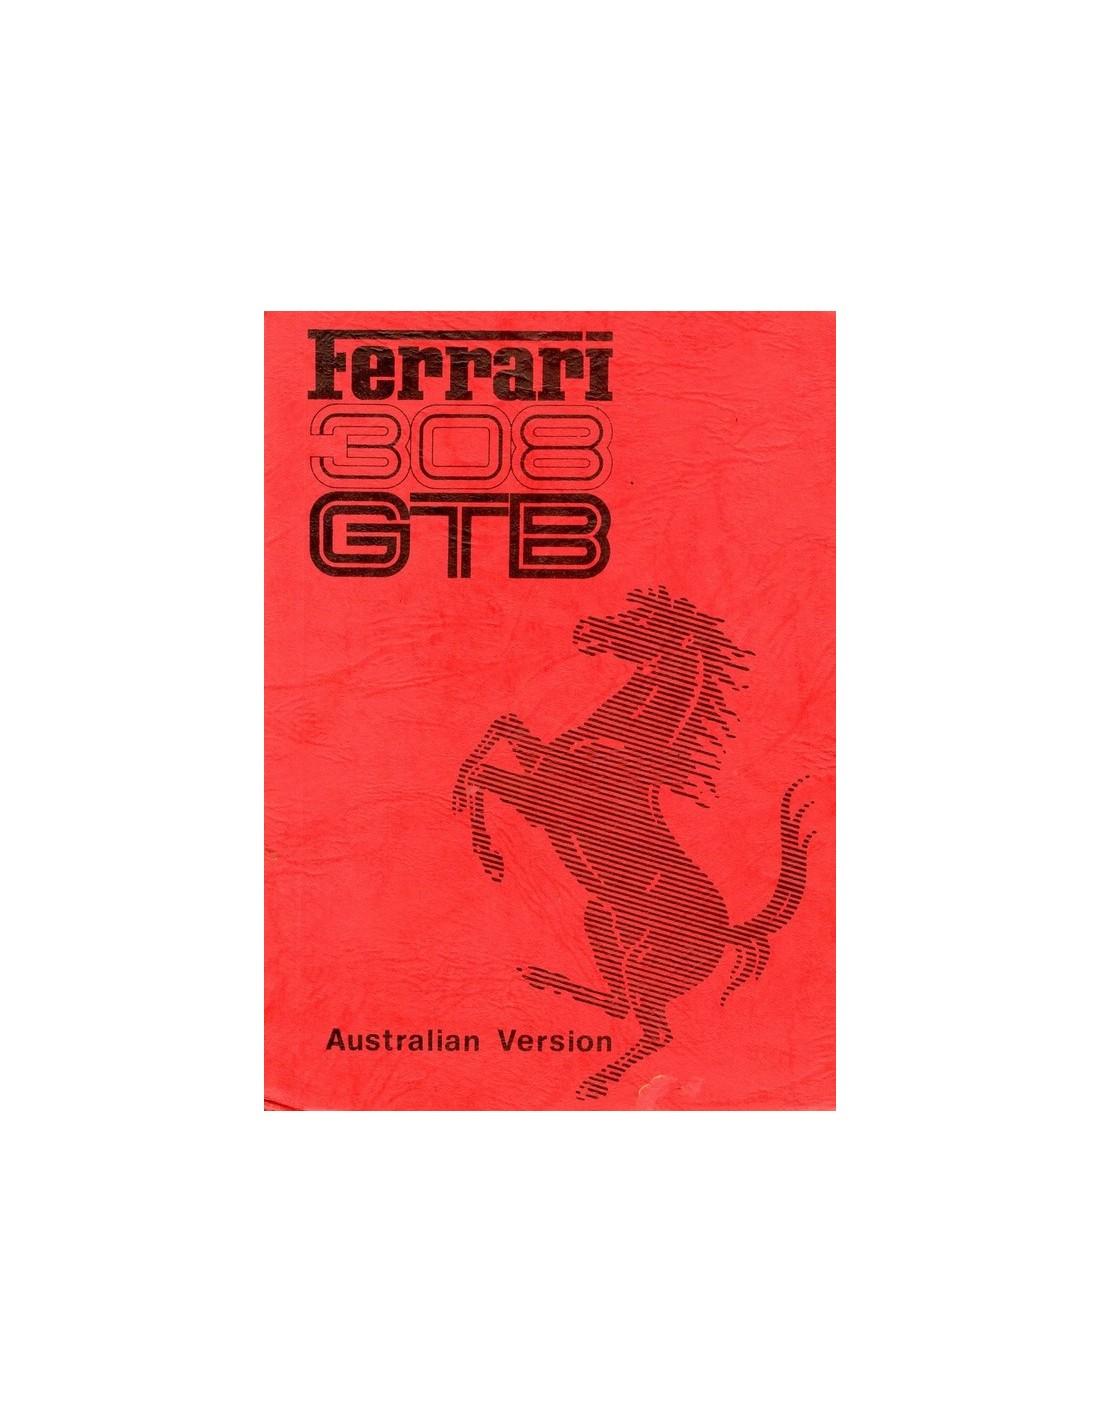 Ferrari Repair Manuals: 1976 FERRARI 308 GTB OWNERS MANUAL AUSTRALIA VERSION 134/76